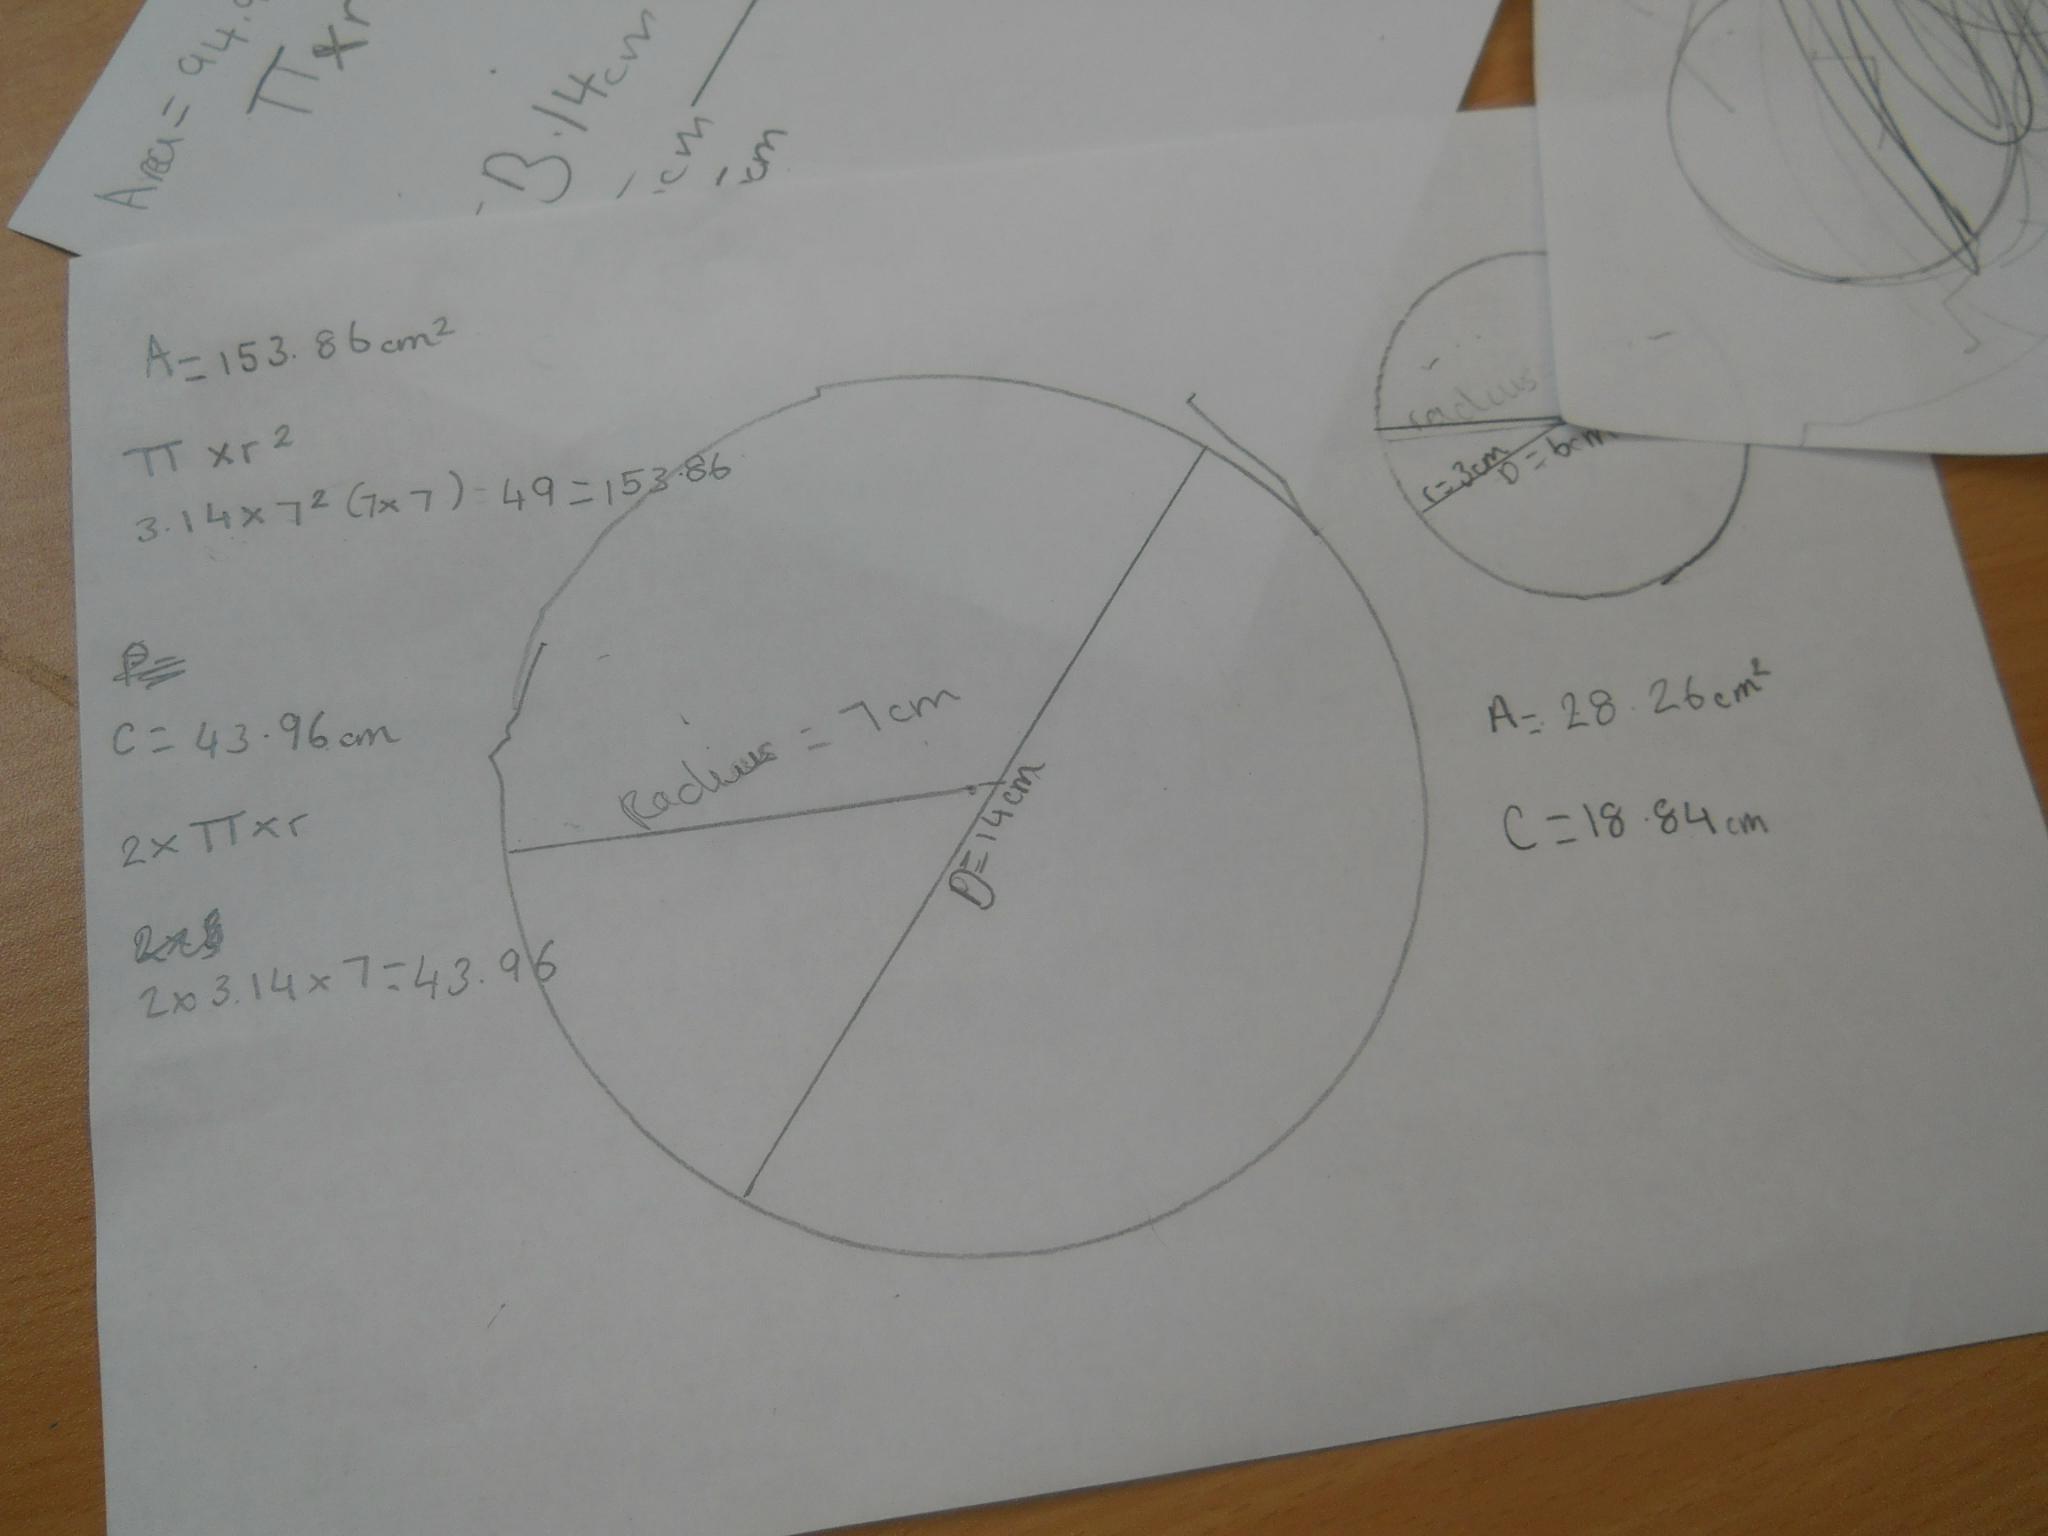 Circle And Calculate The Surface Area Of A Cylinder Dscn1482 ·  Dscn1472 · Dscn1473 · Dscn1474